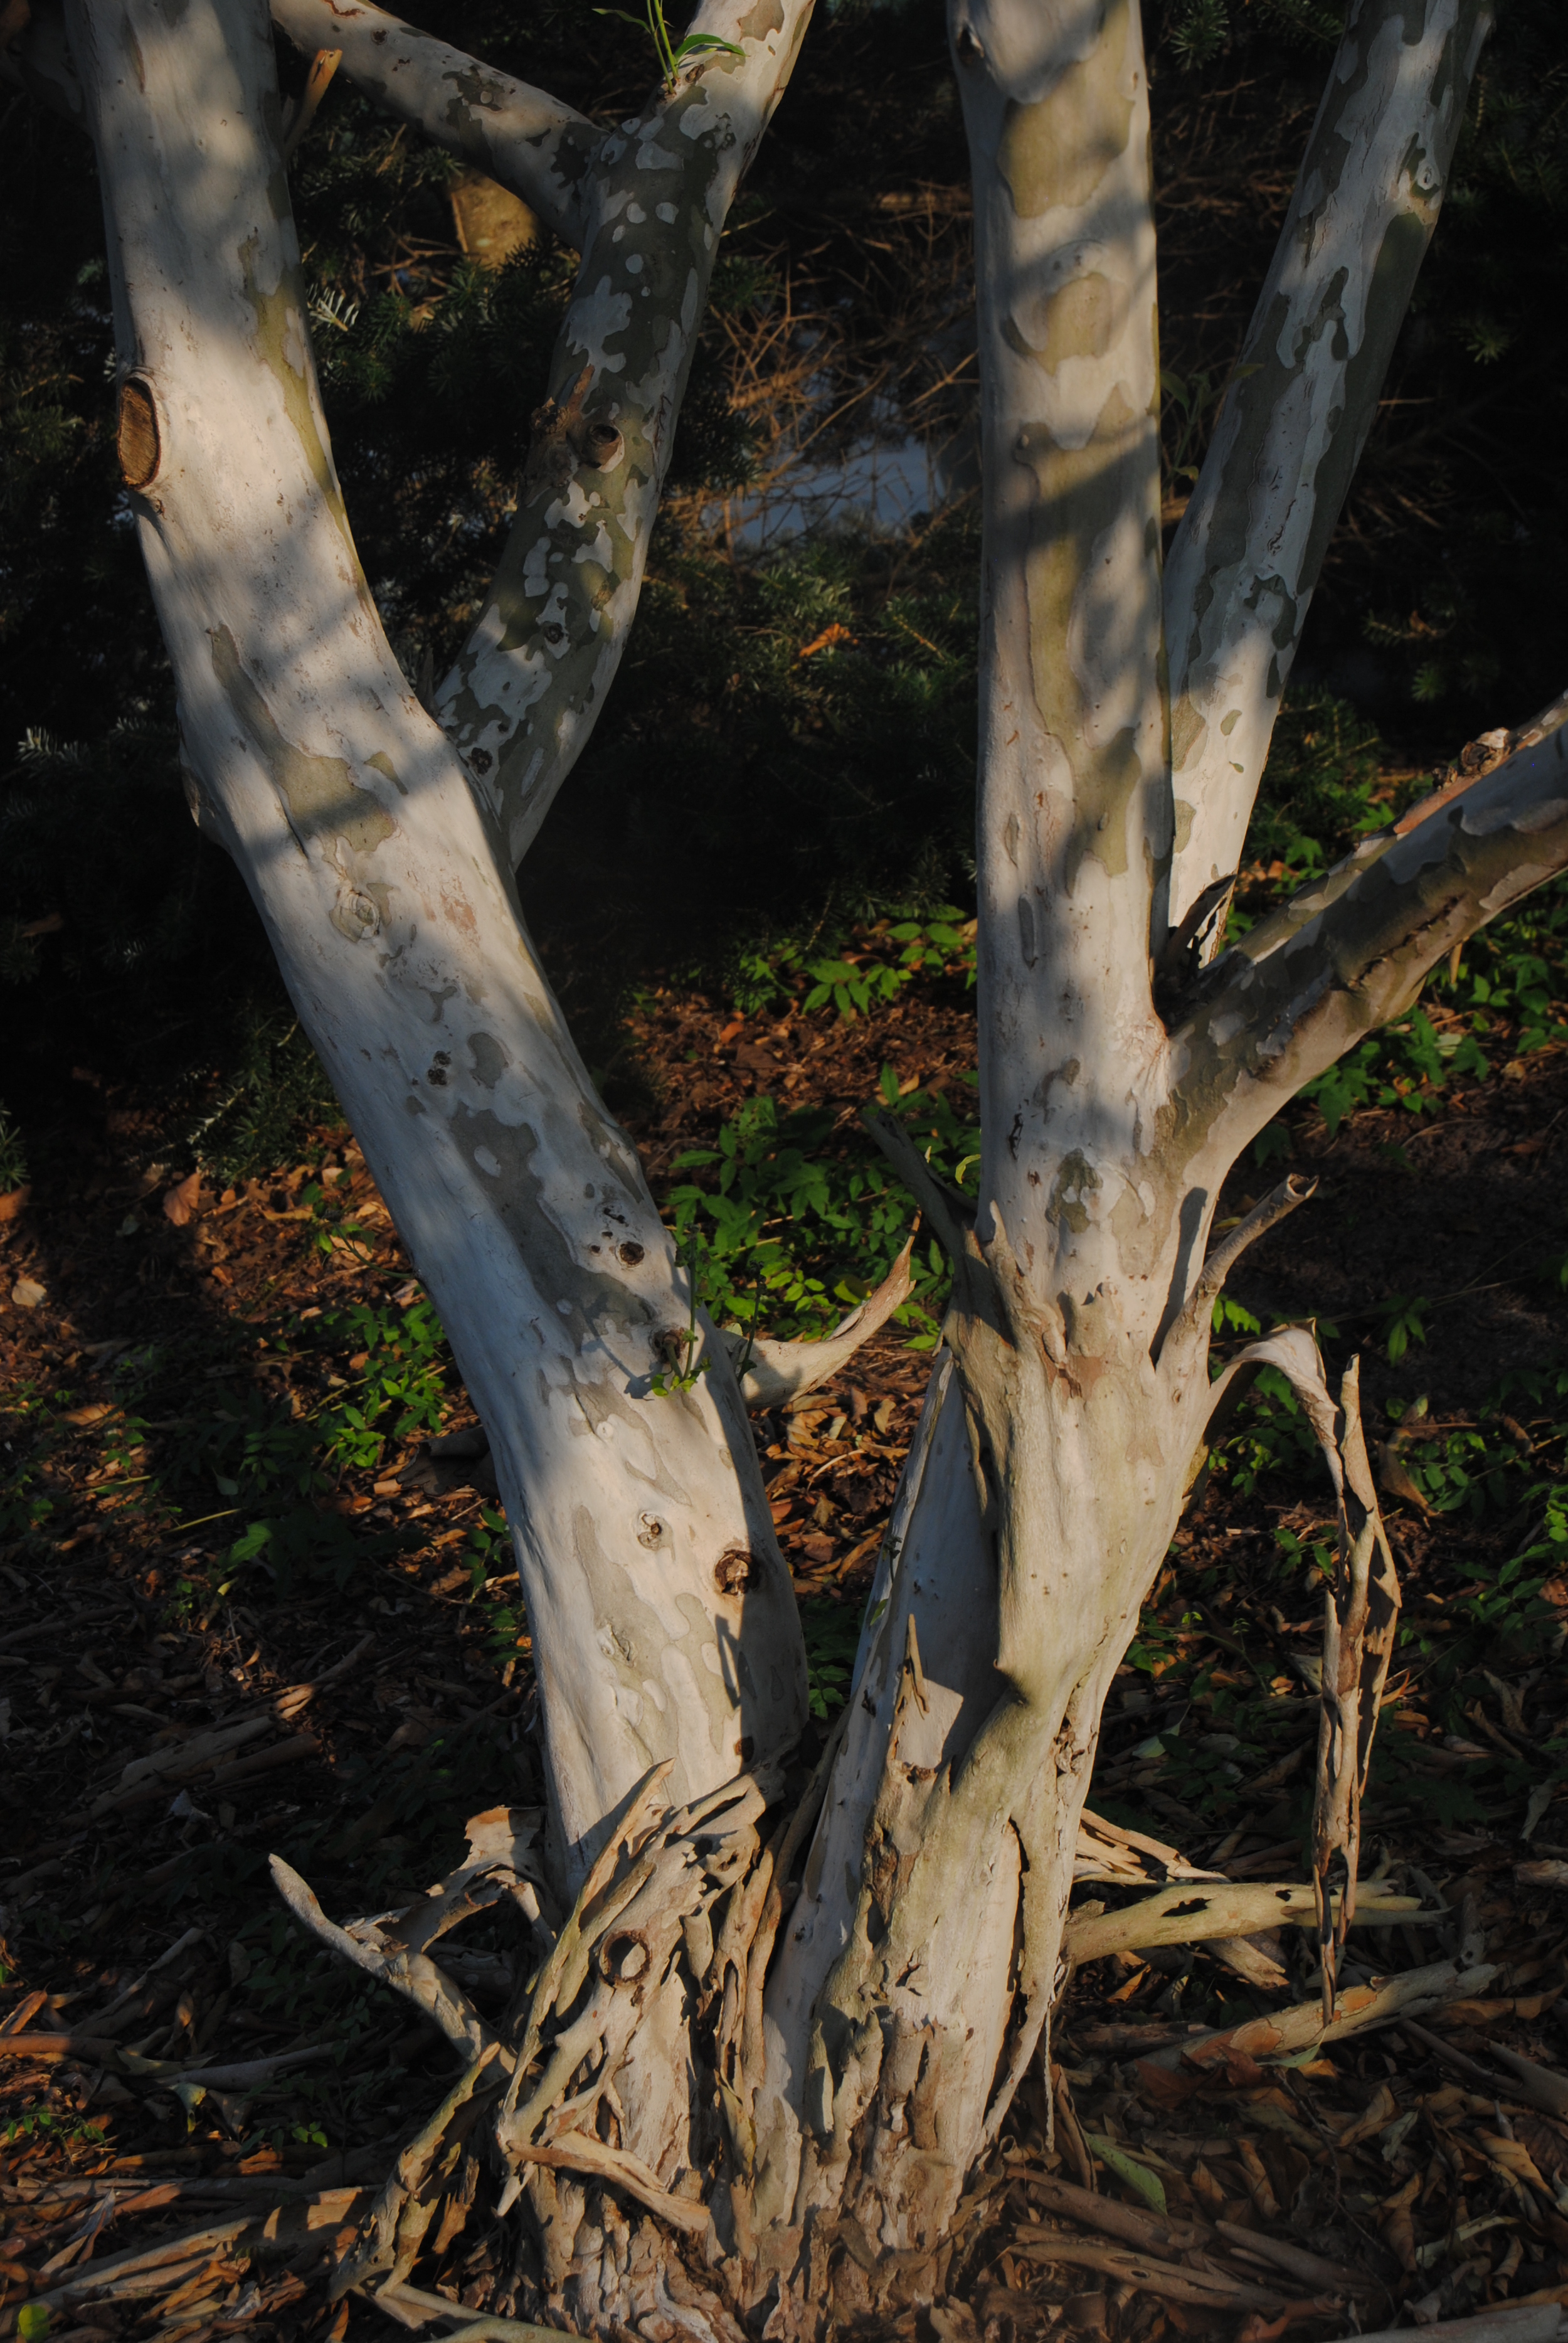 The peeling bark on the JCRA's tree.